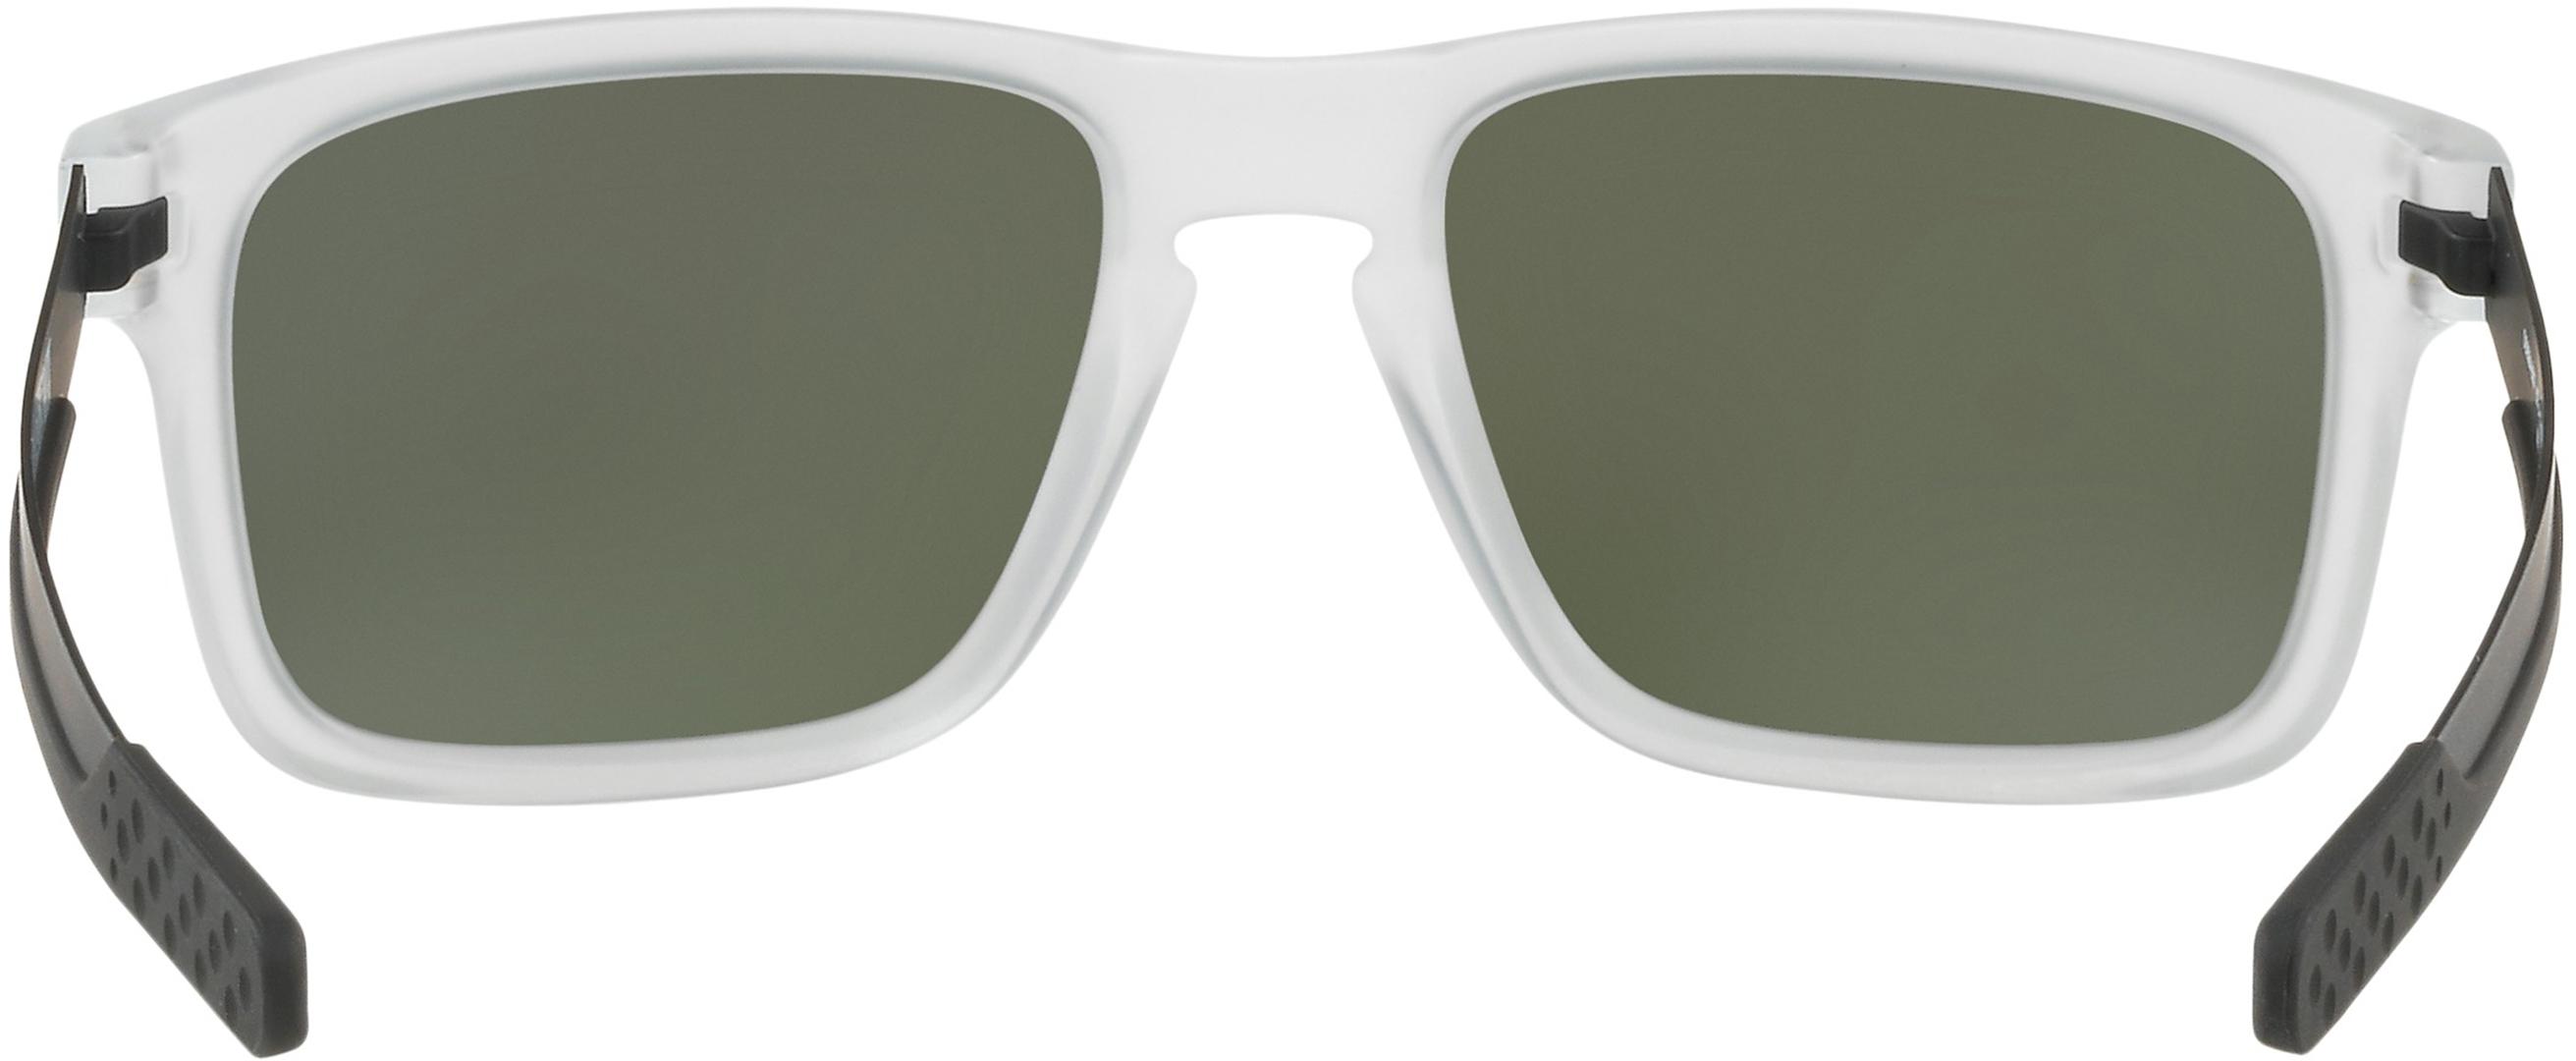 HOLBROOK MIX Sonnenbrille matte clear/prizm black | Warehouse One